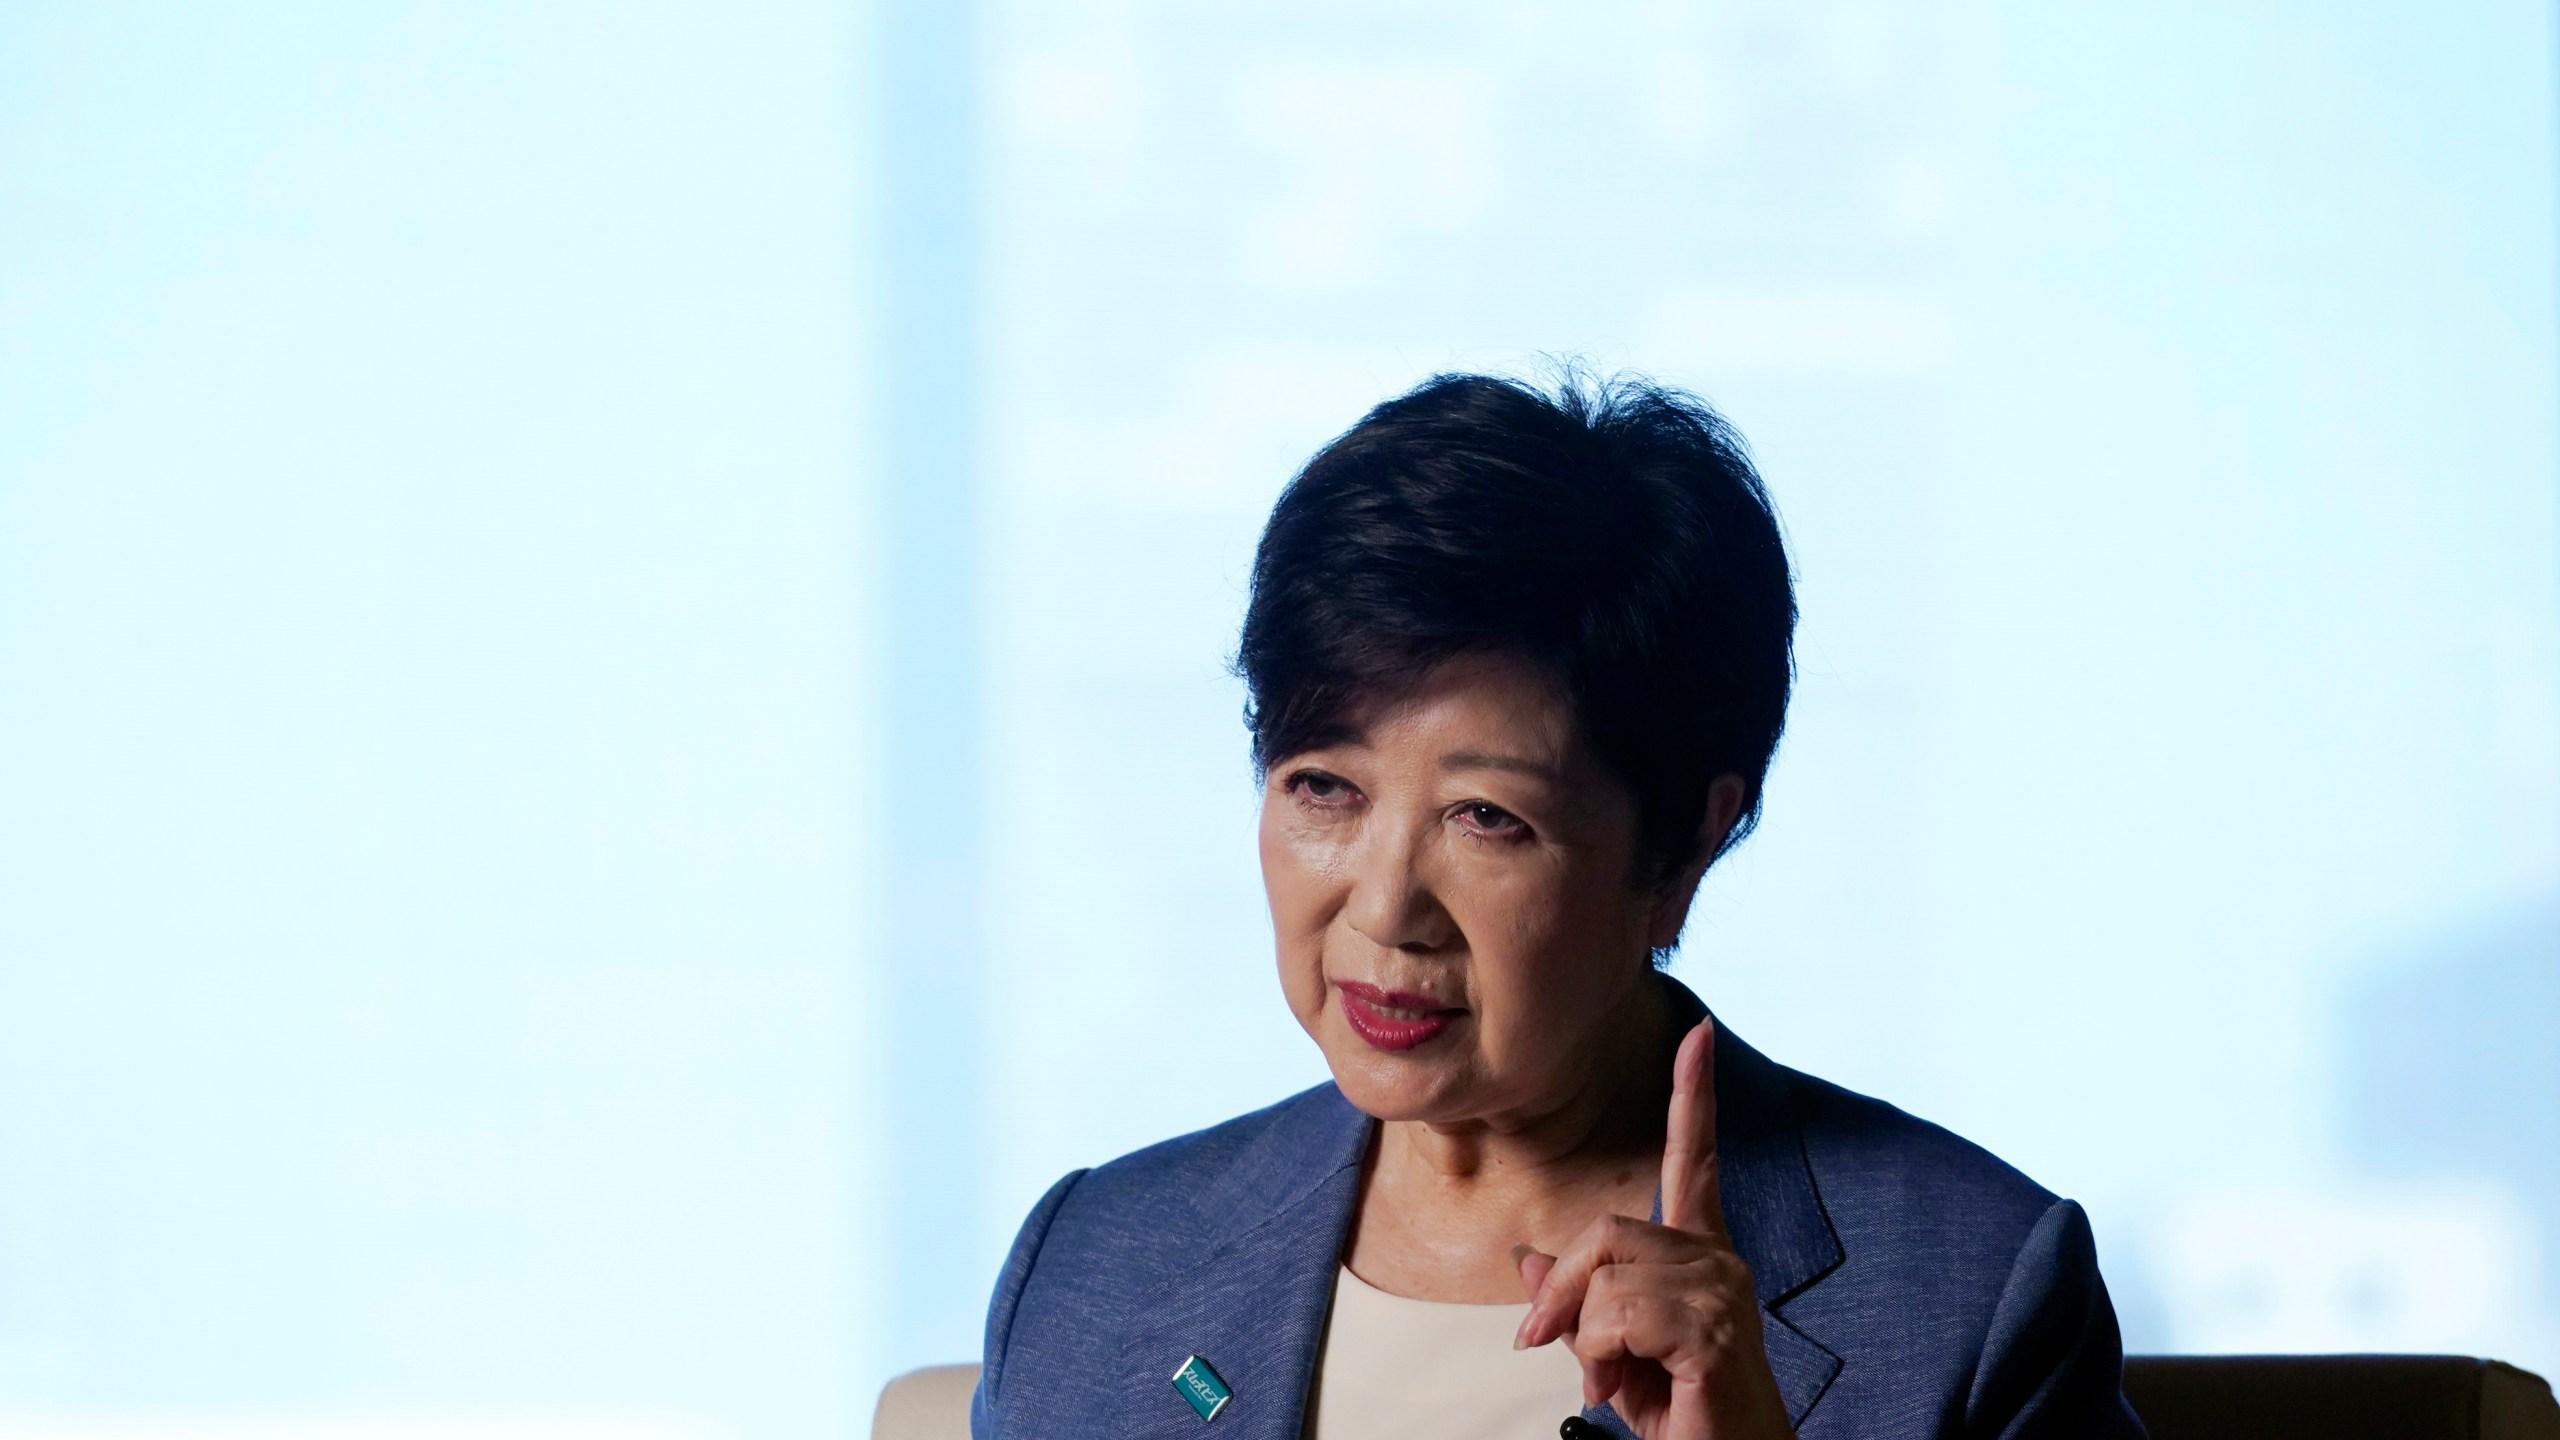 Alexa Blum Videos Porno call to cancel tokyo olympics enters race for tokyo governor